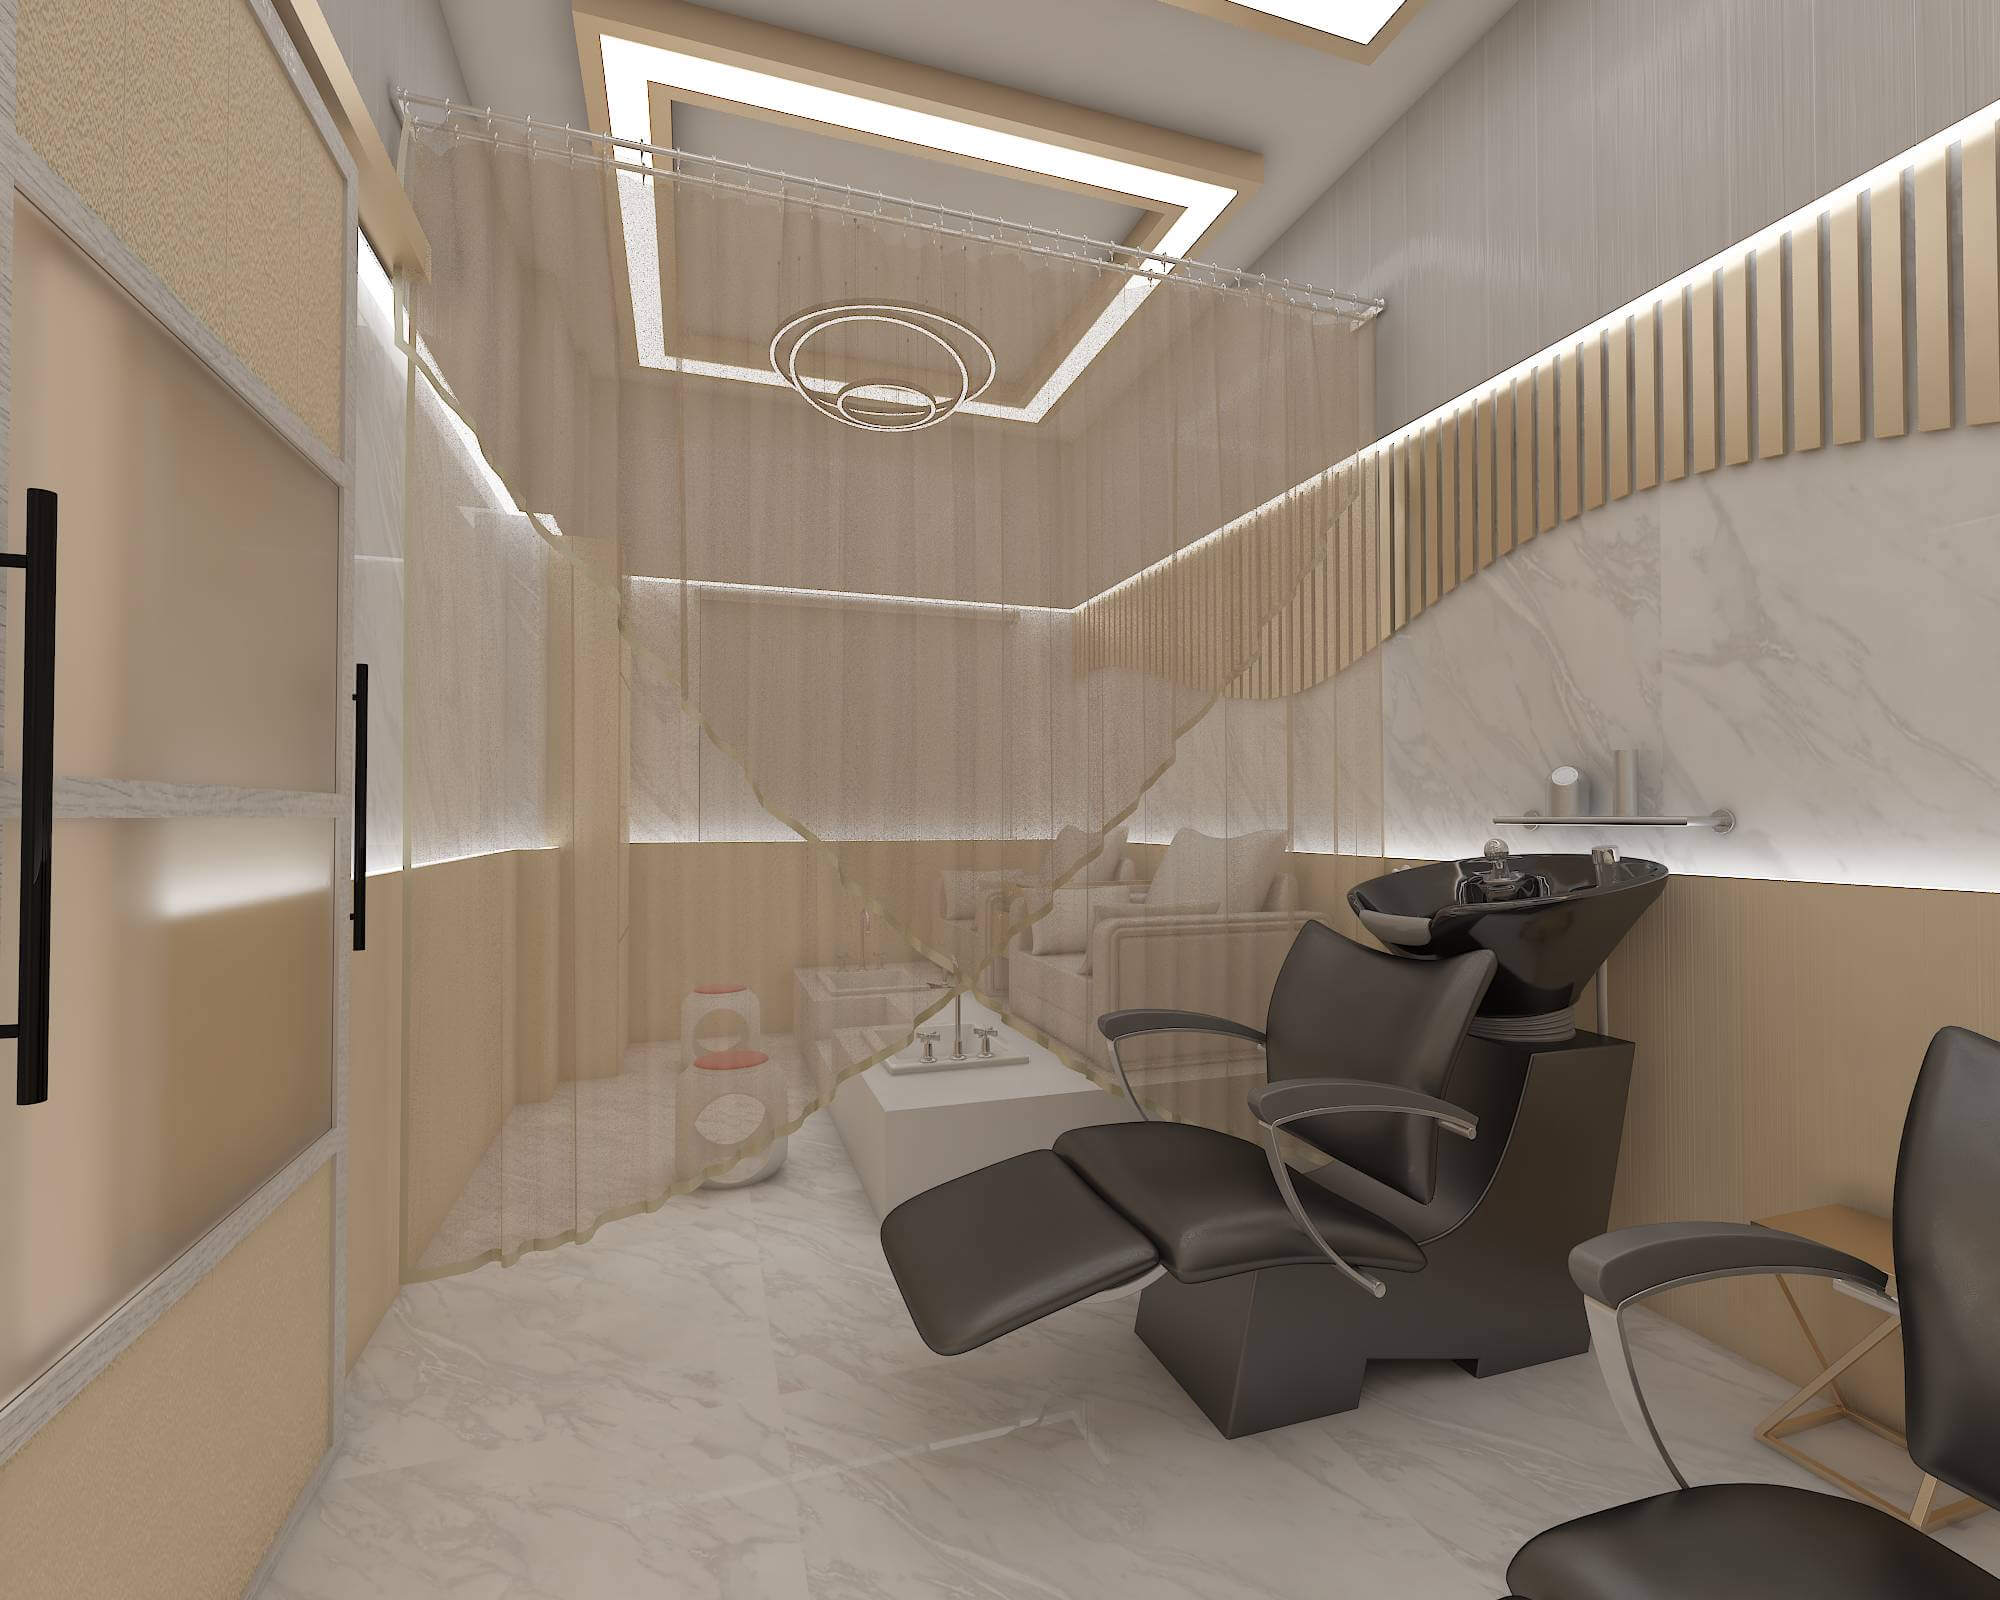 Hair washing unit beauty parlor design